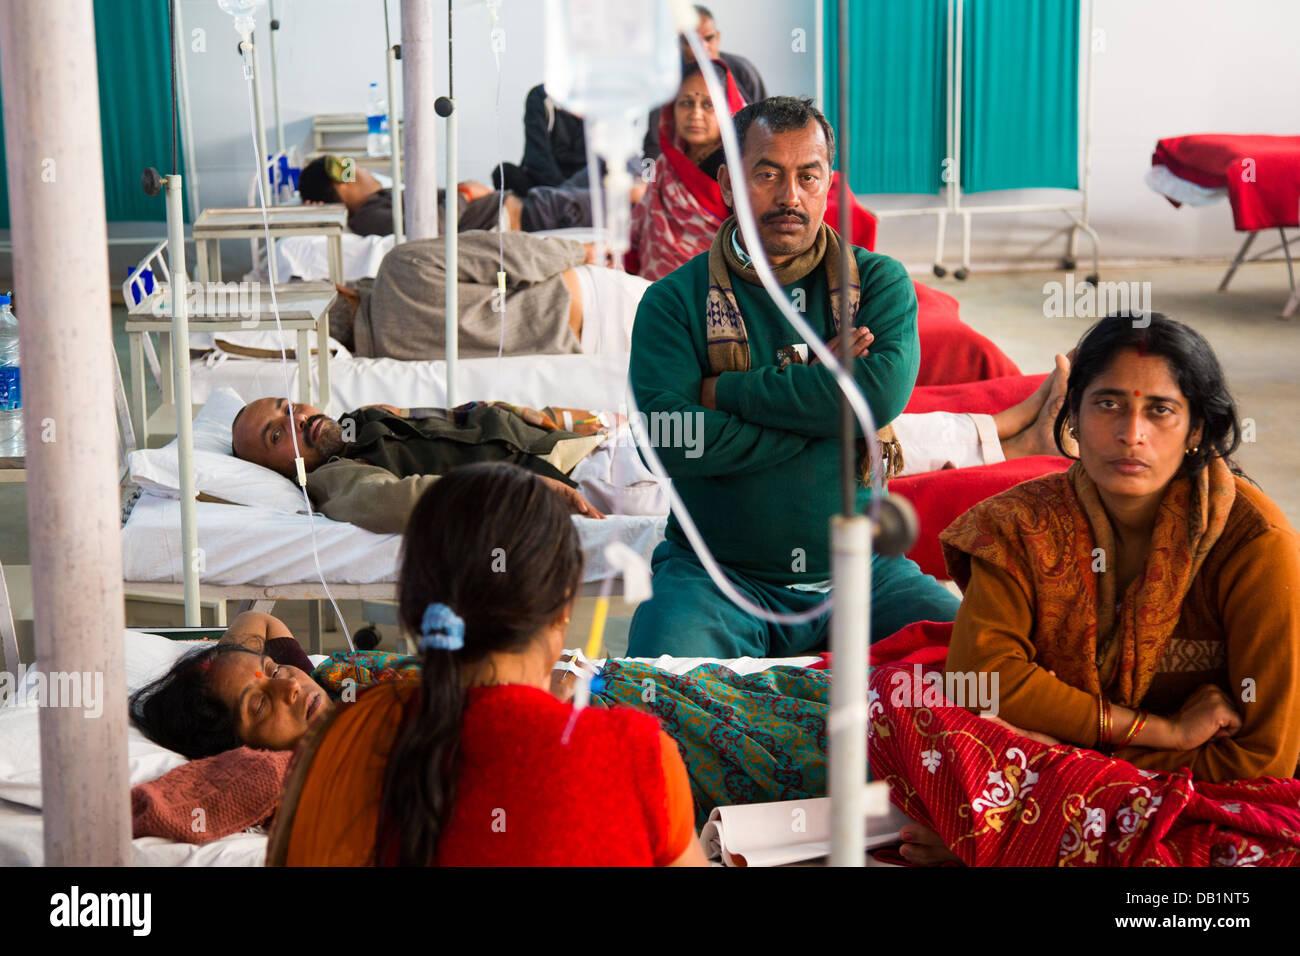 Clinic at the Kumbh Mela, Allahabad, India - Stock Image